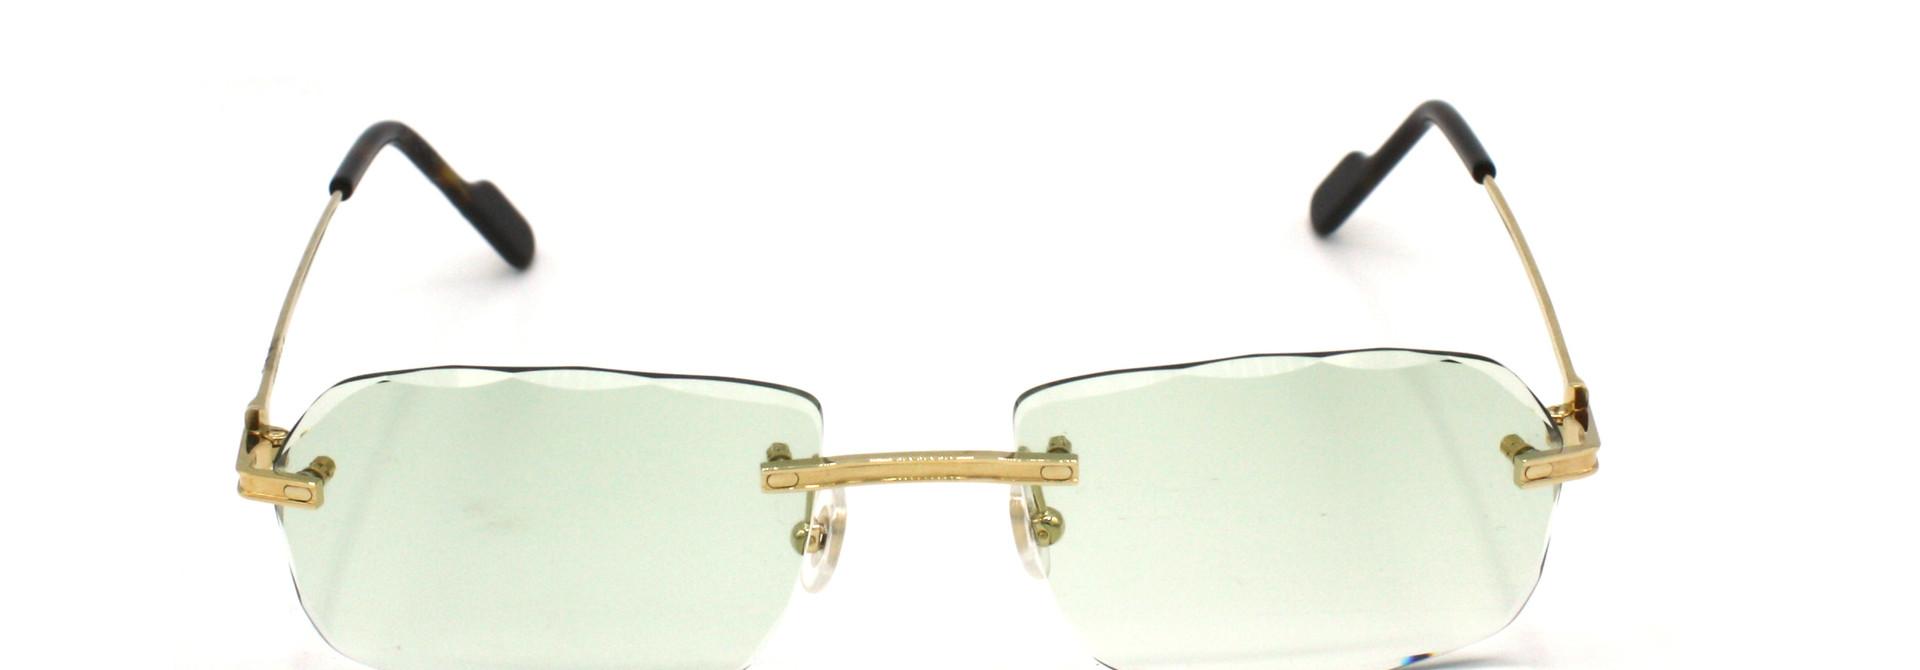 Cartier - CT0259O - 002 Light Green Special Diamond Cut